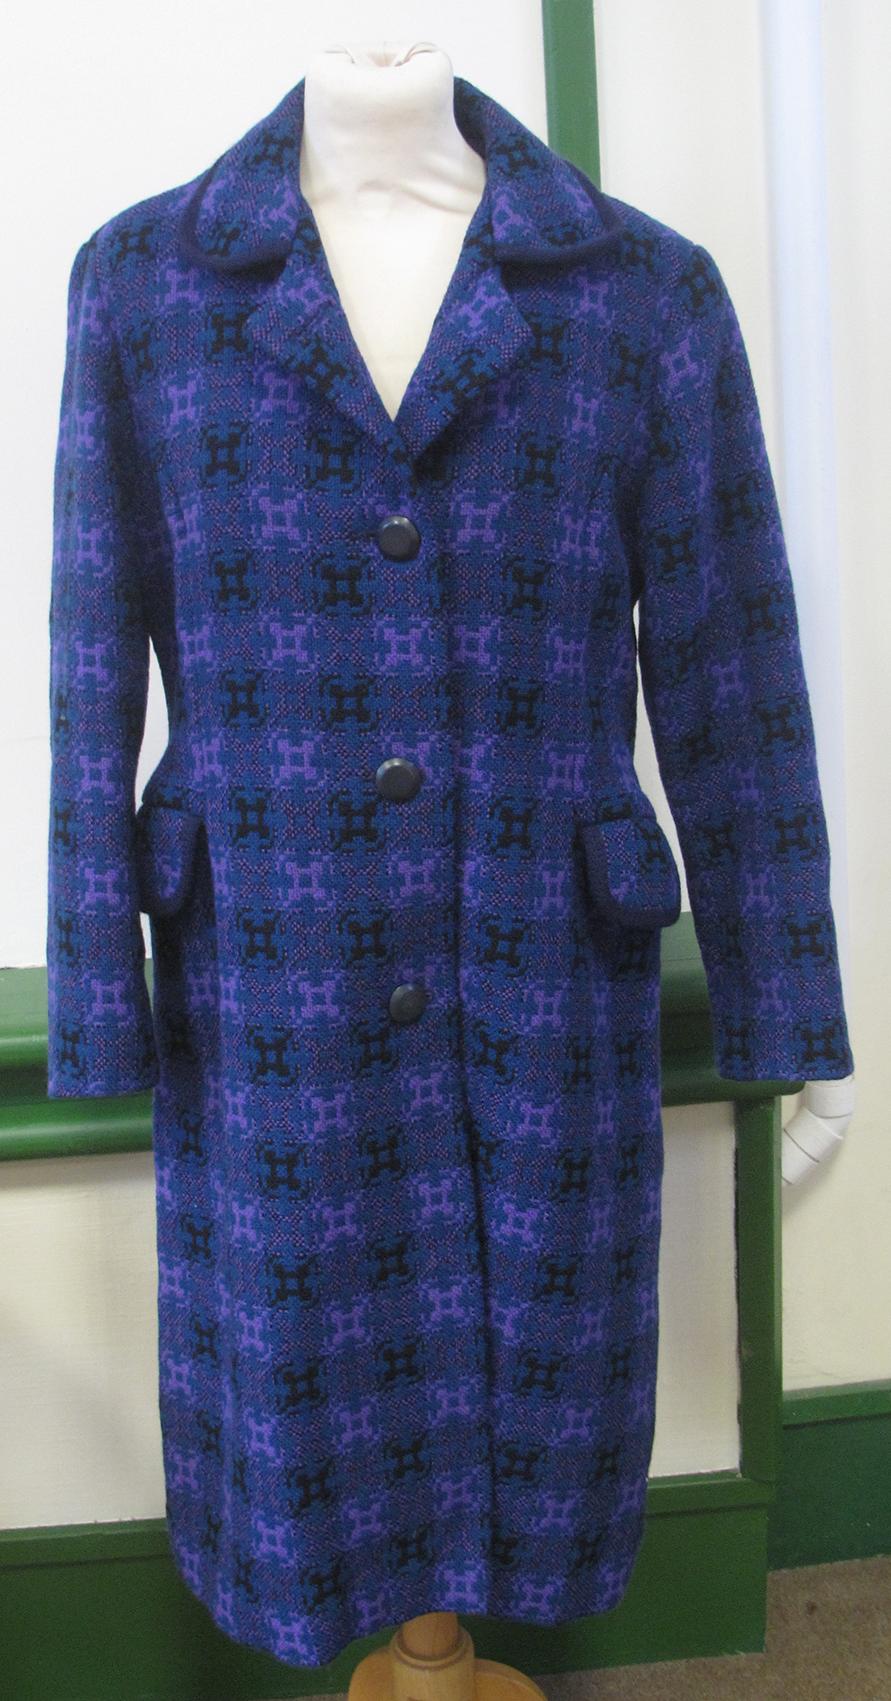 Lot 54 - A vintage Welsh tapestry ladies coat by Reseta of Wales.  Estimate £40-60